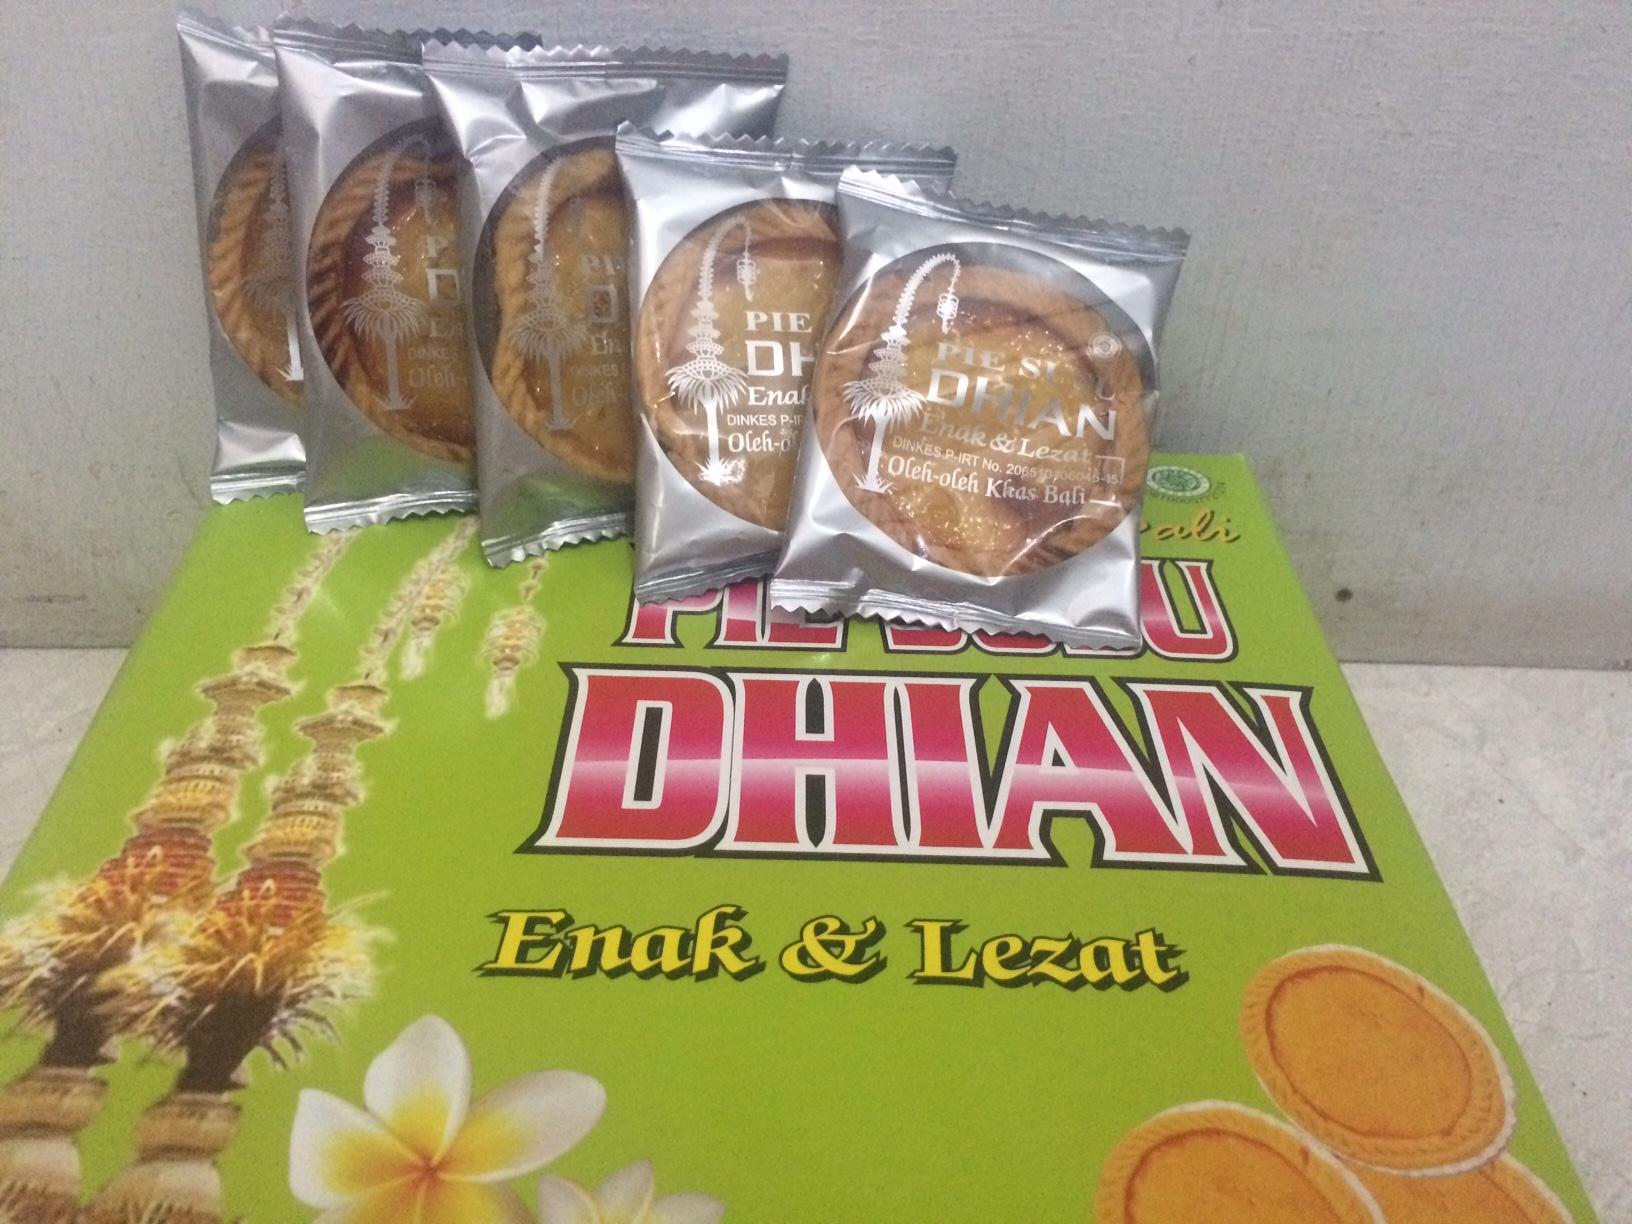 Buy Imlek And Valentine Promo Pie Susu Dhian 6 Pilihan Rasa 1 Box 50 Khas Bali Tahan 7 Hari Di Ruang Terbuka Dan 14 Dalam Kulkas